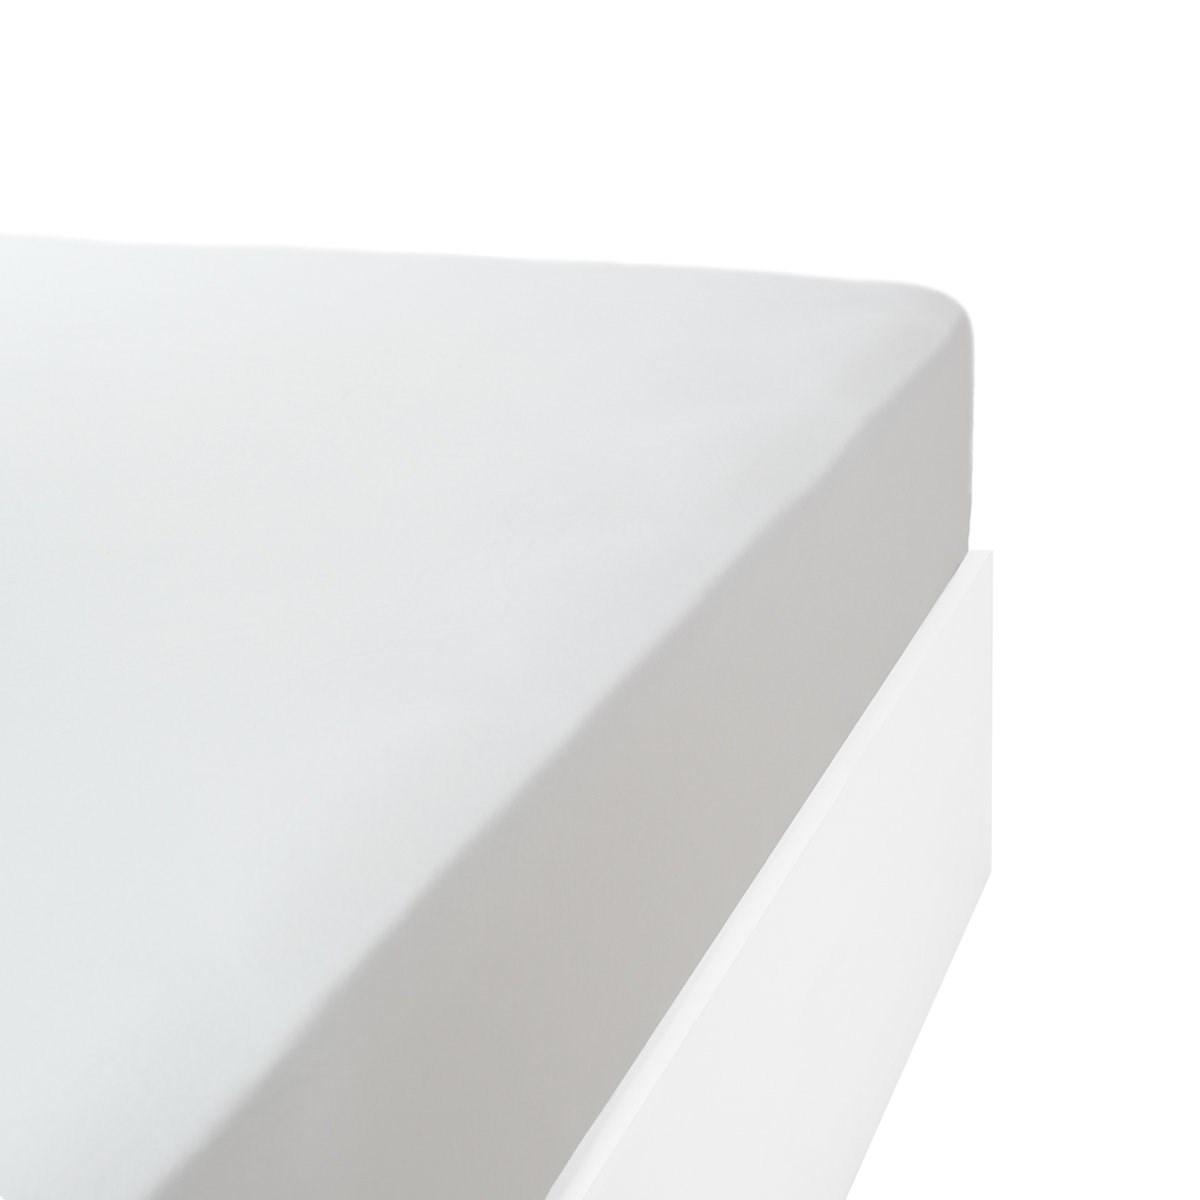 Drap housse jersey extensible en coton blanc 160x200 cm